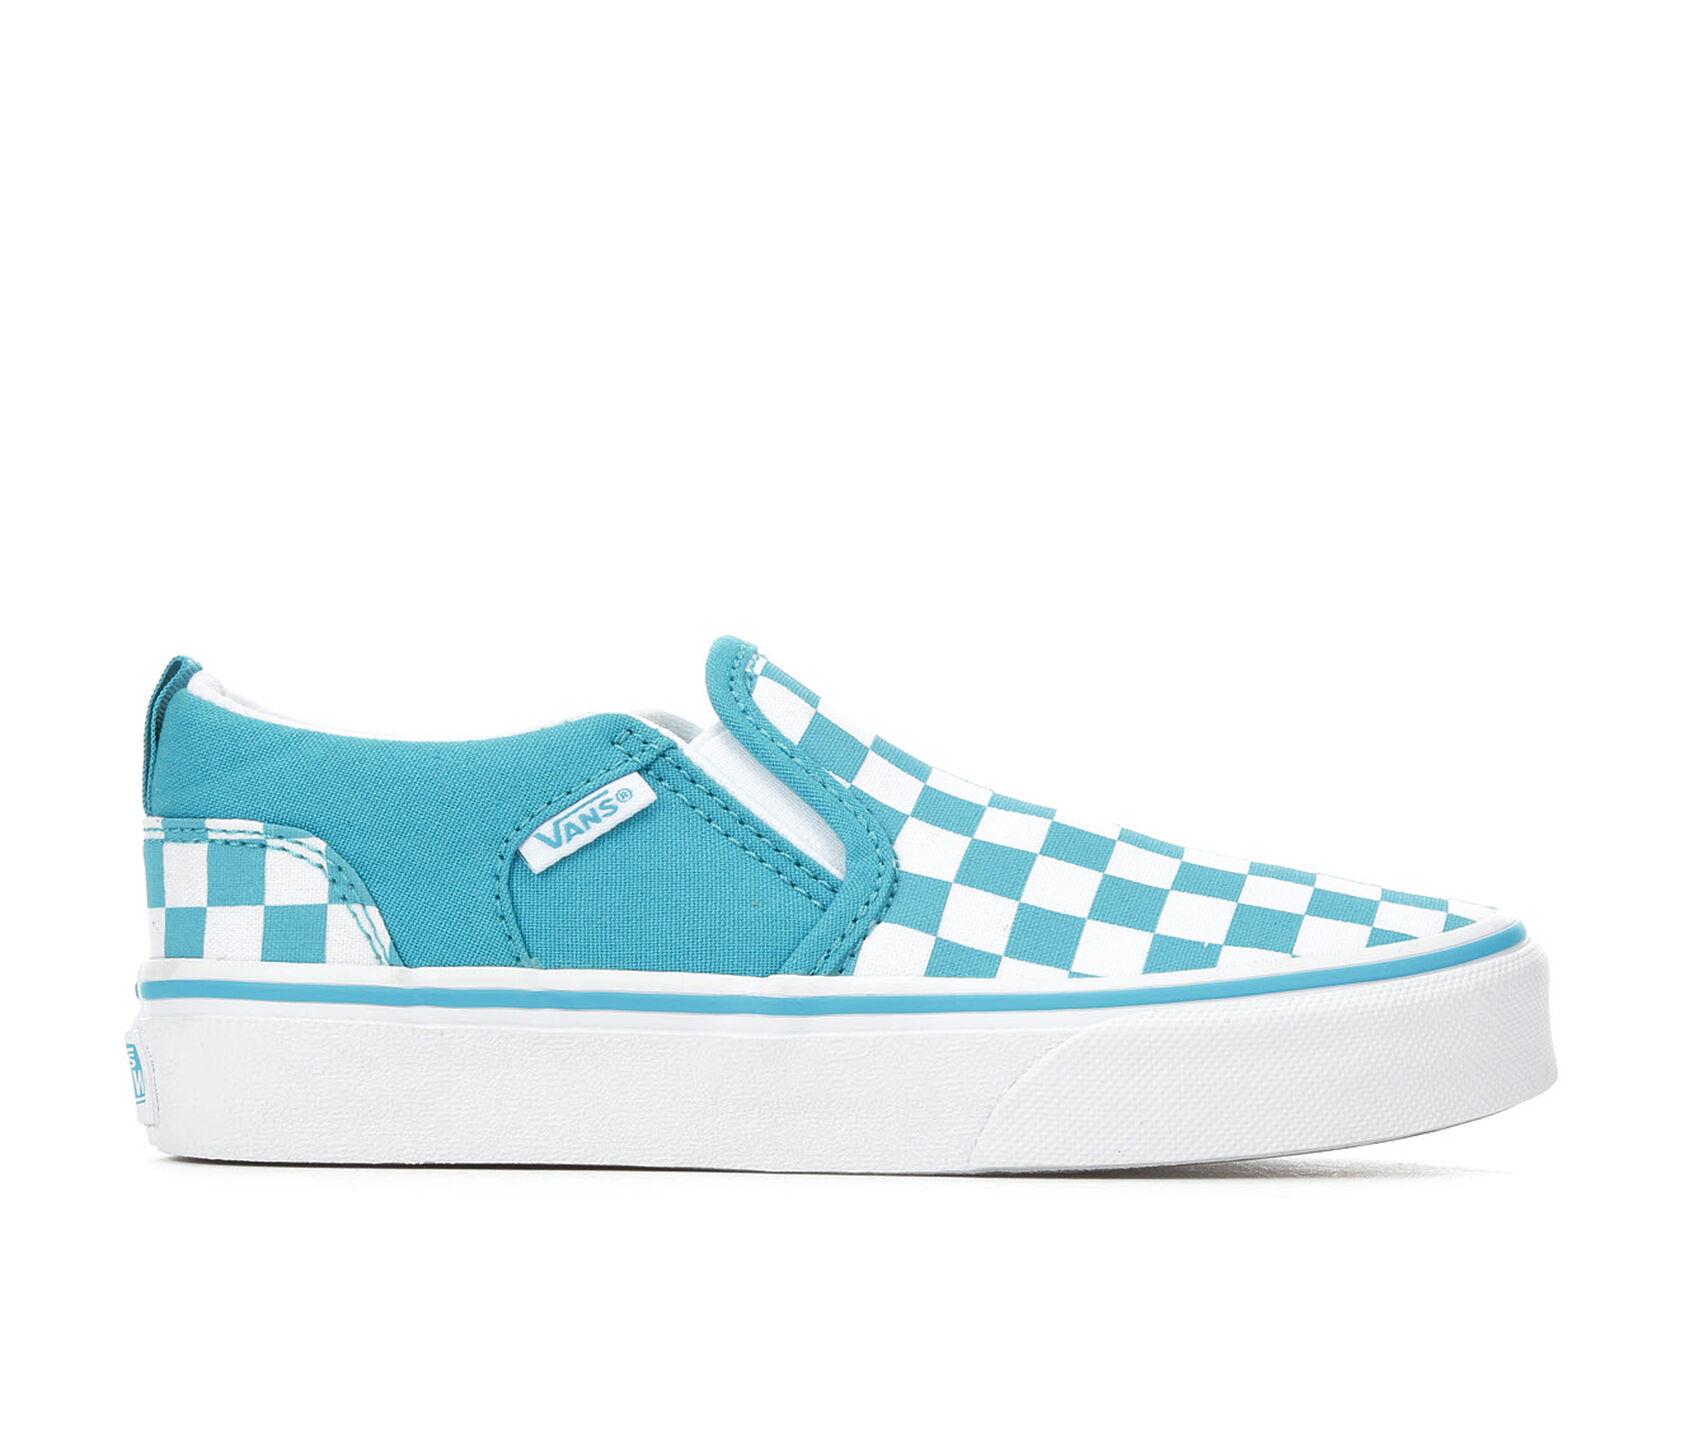 special buy buy real great discount Girls' Vans Little Kid & Big Kid Asher Slip-On Skate Shoes